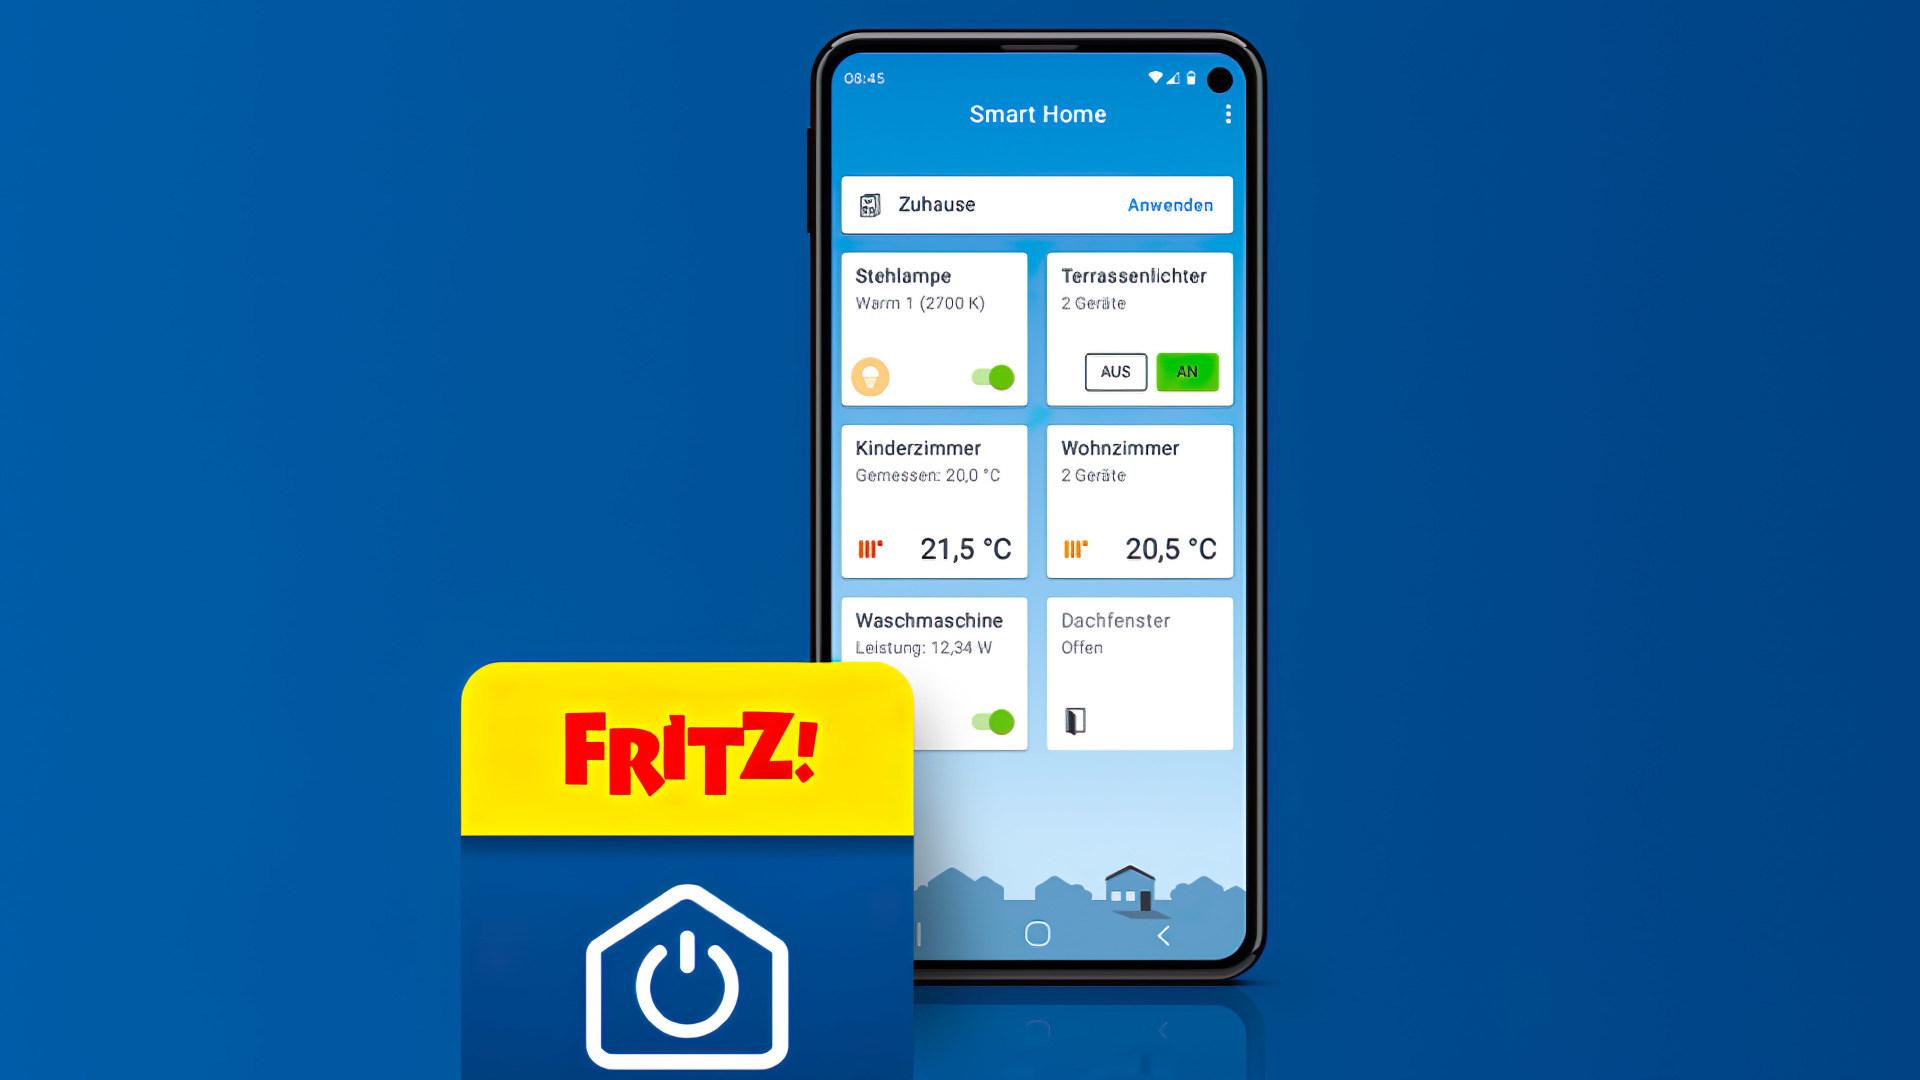 Avm, MyFritz, Fritzapp, MyFritzApp, Smarthome, FritzApp SmartHome